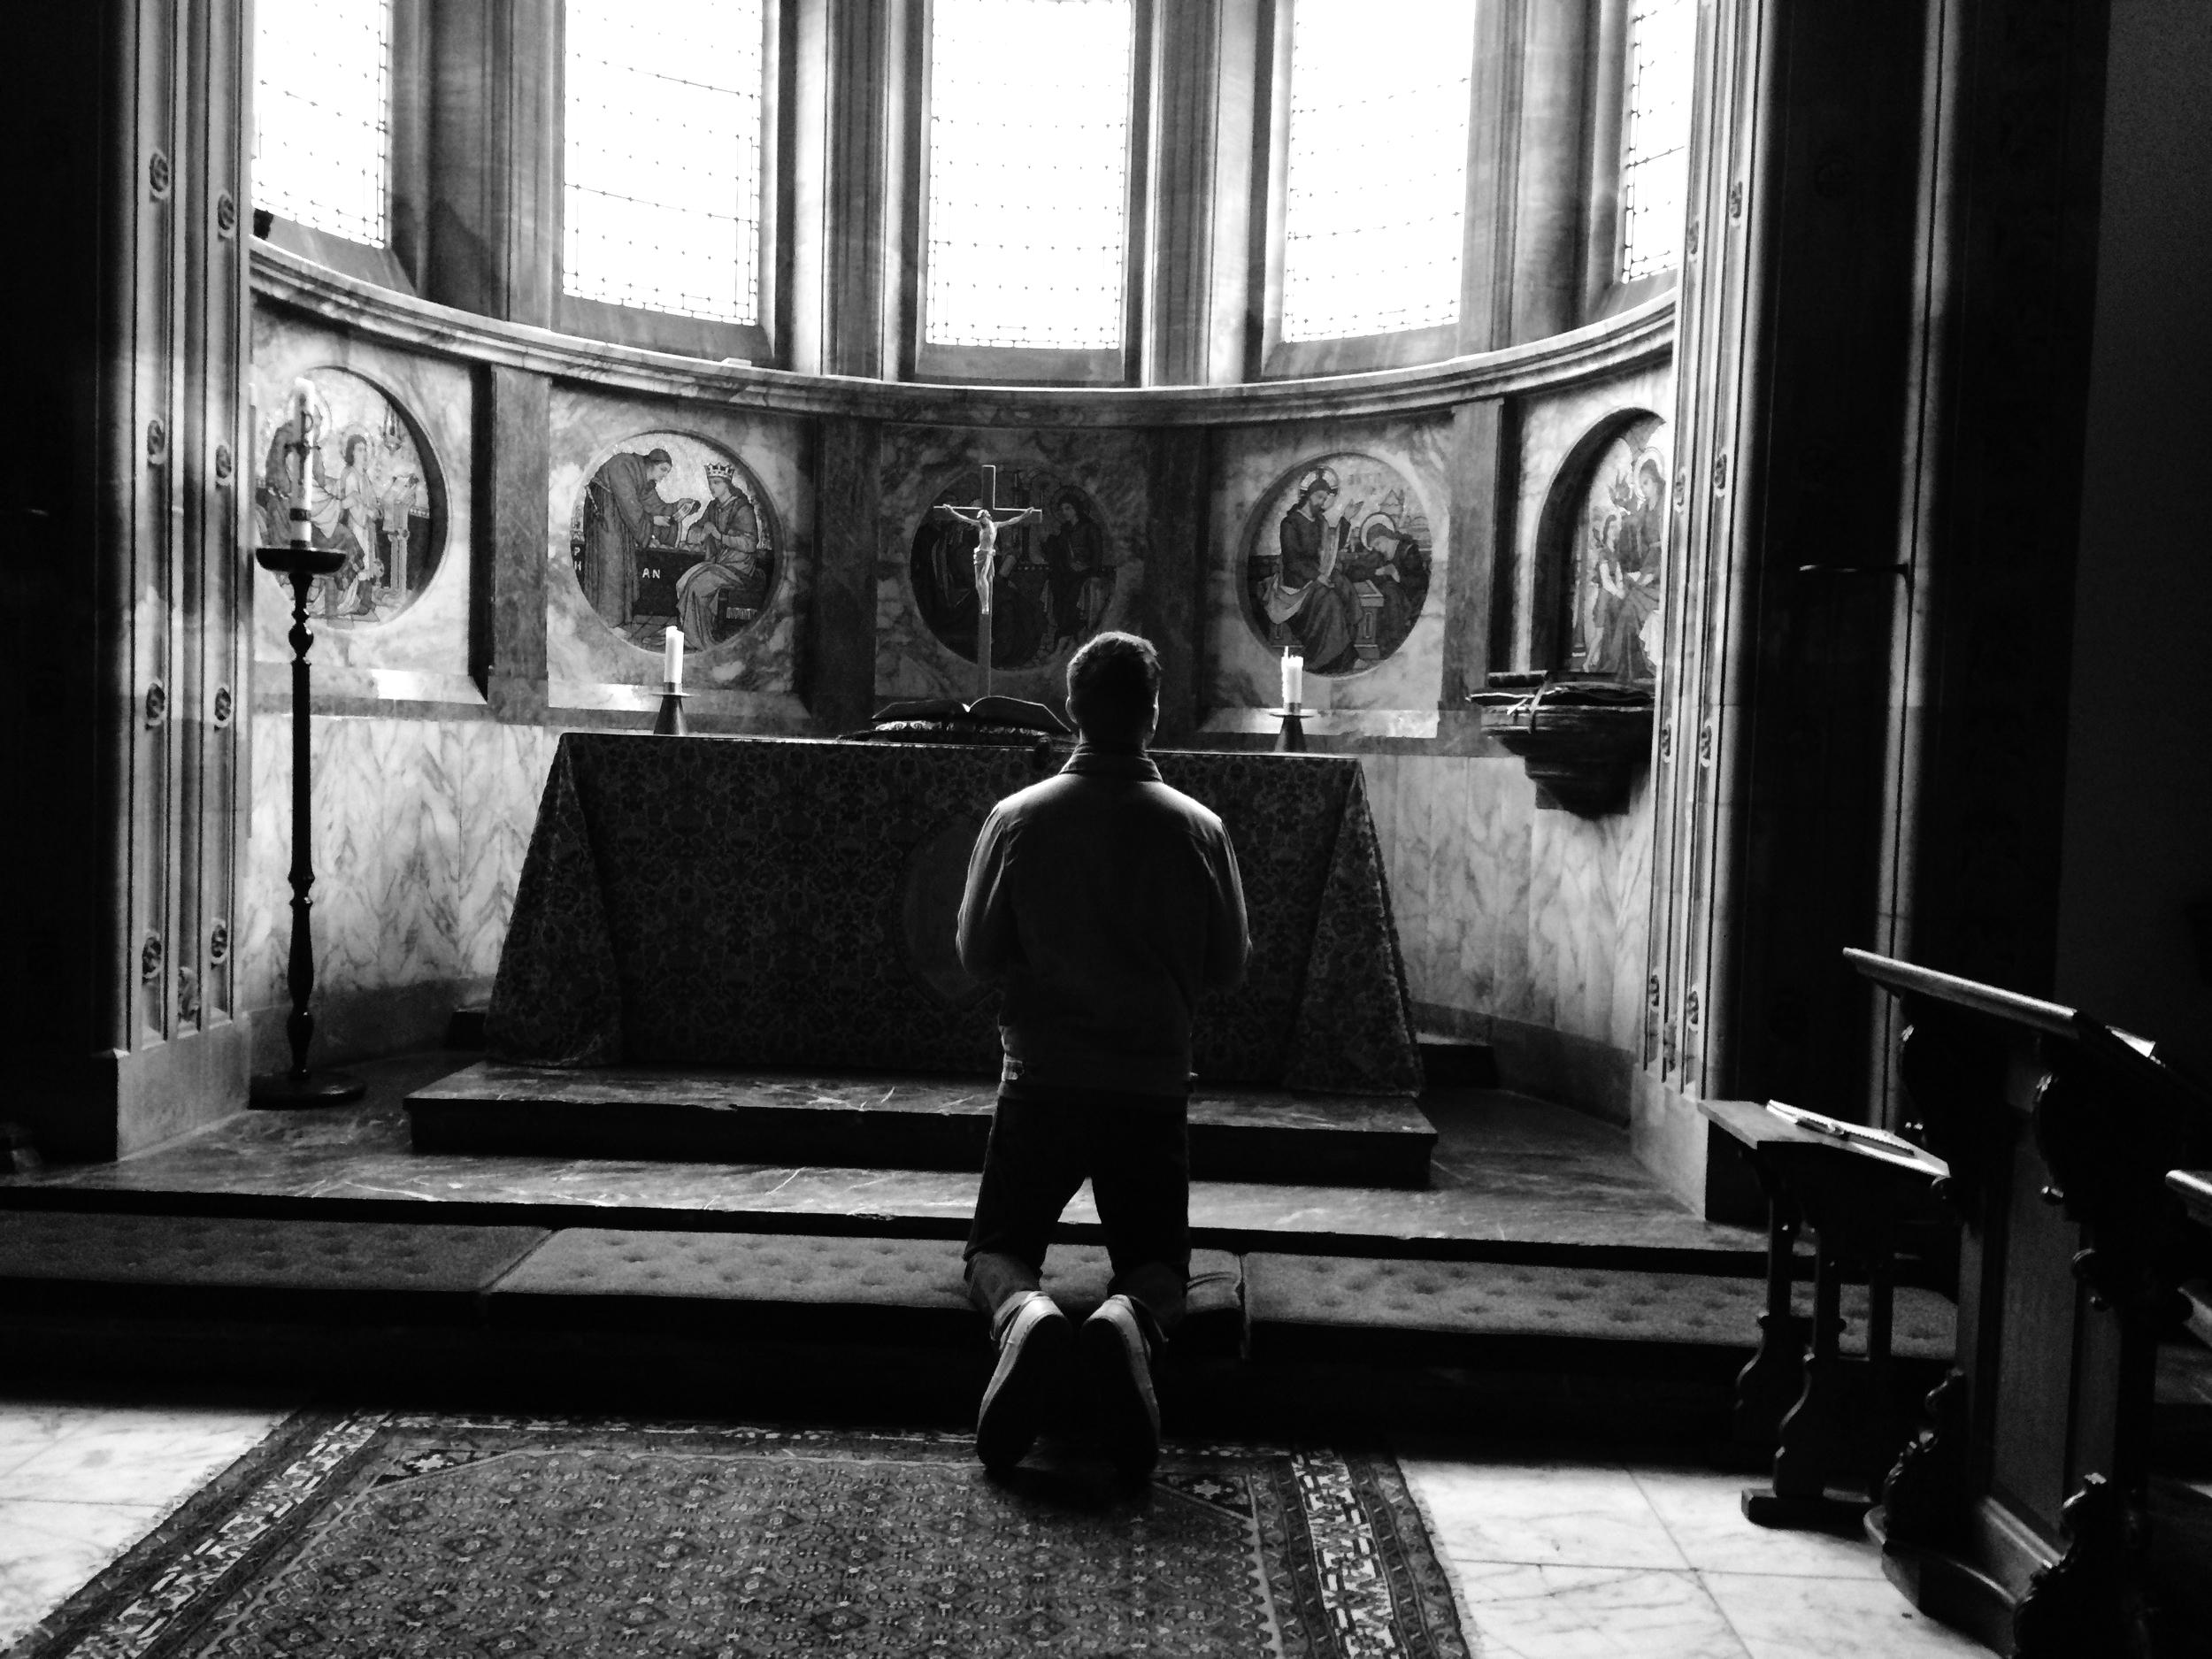 The Discipline of Prayer - By Andrew Rutten